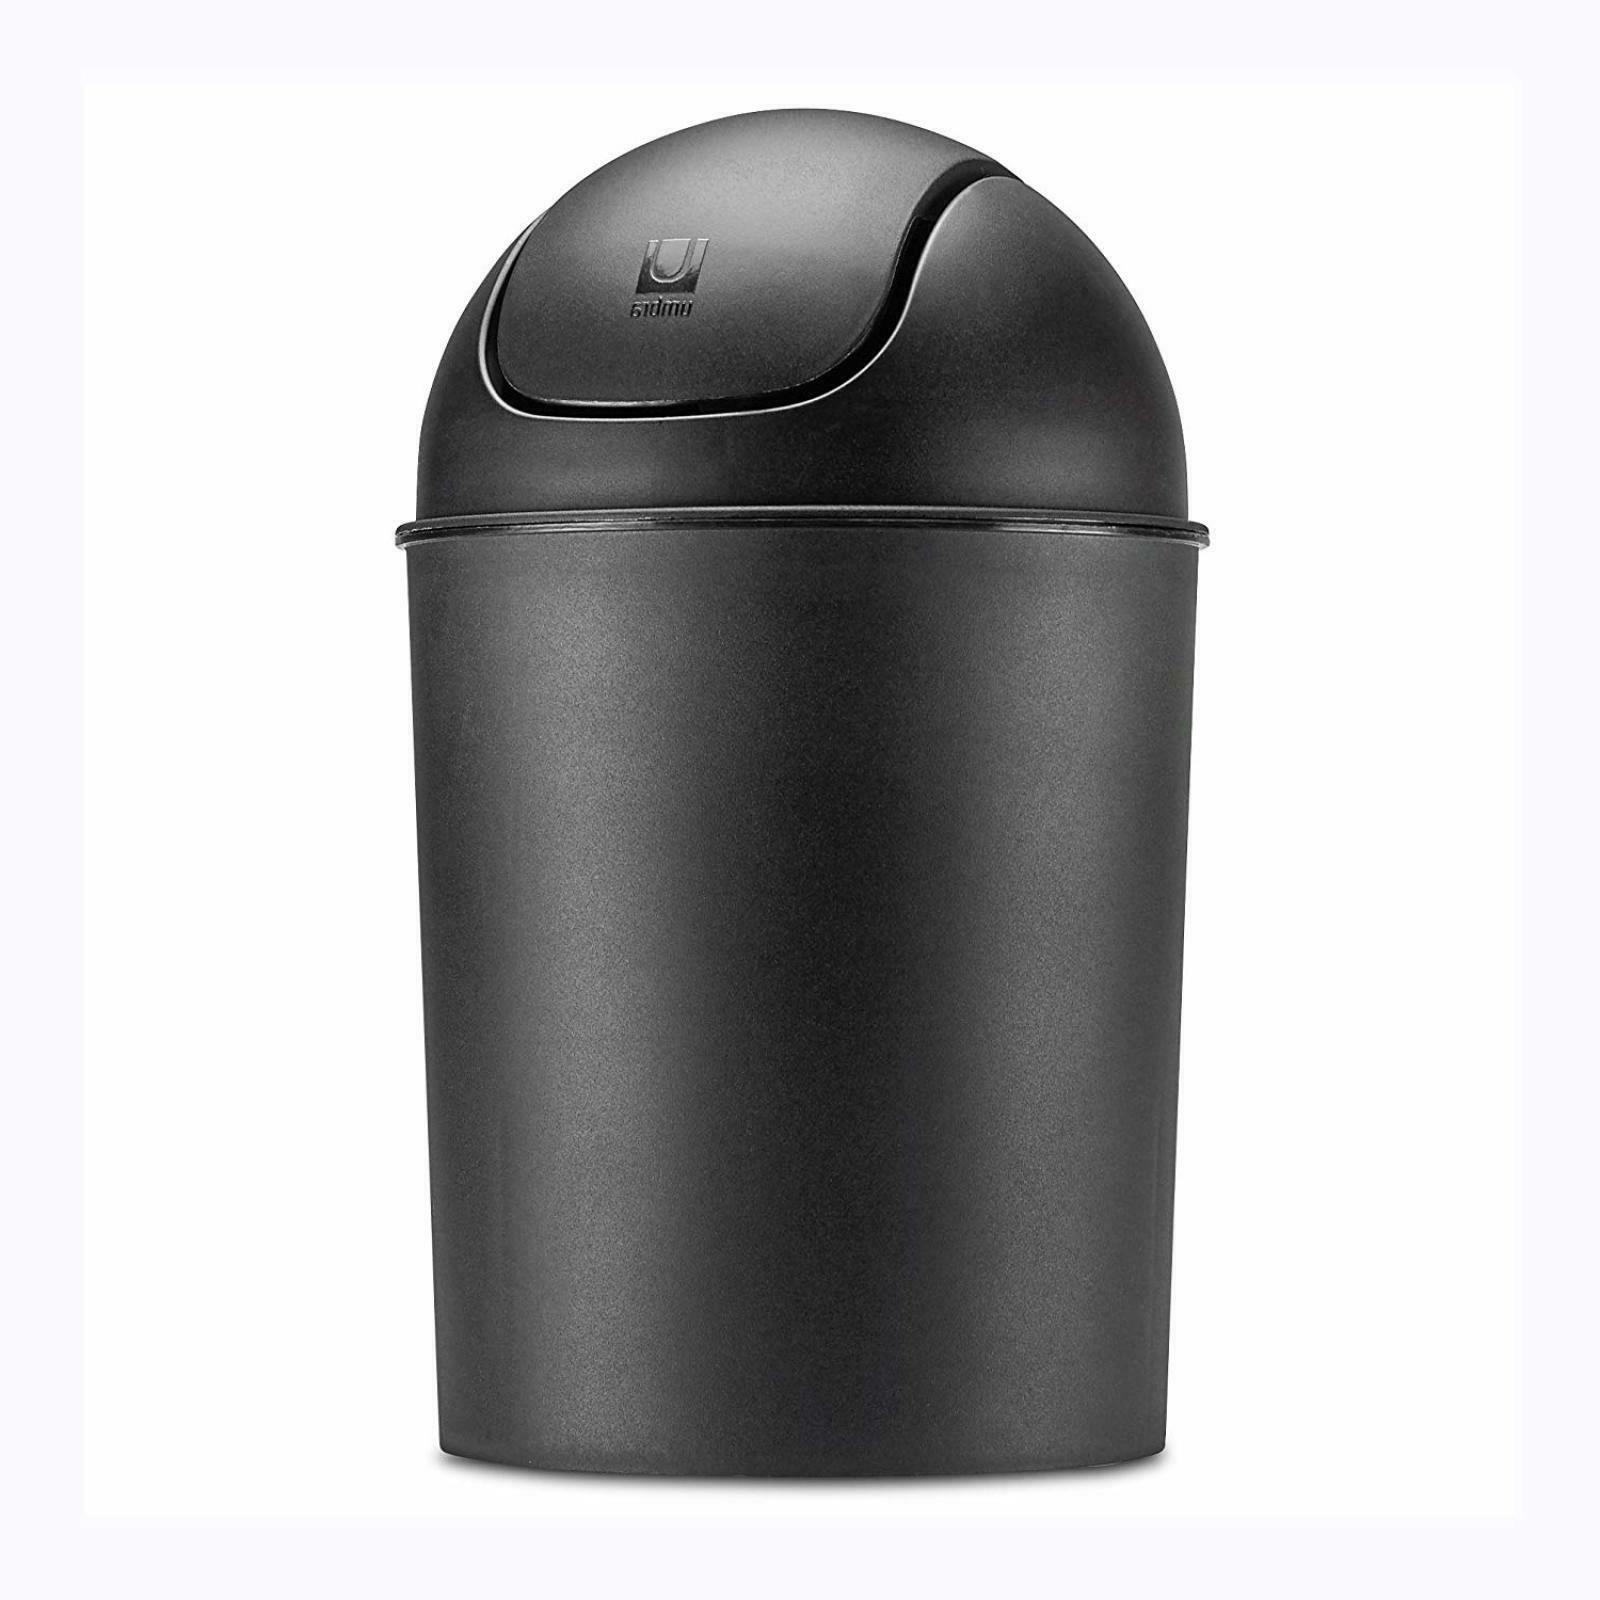 Small Can Lid Waste Basket Bin Matte 1.5 gallon